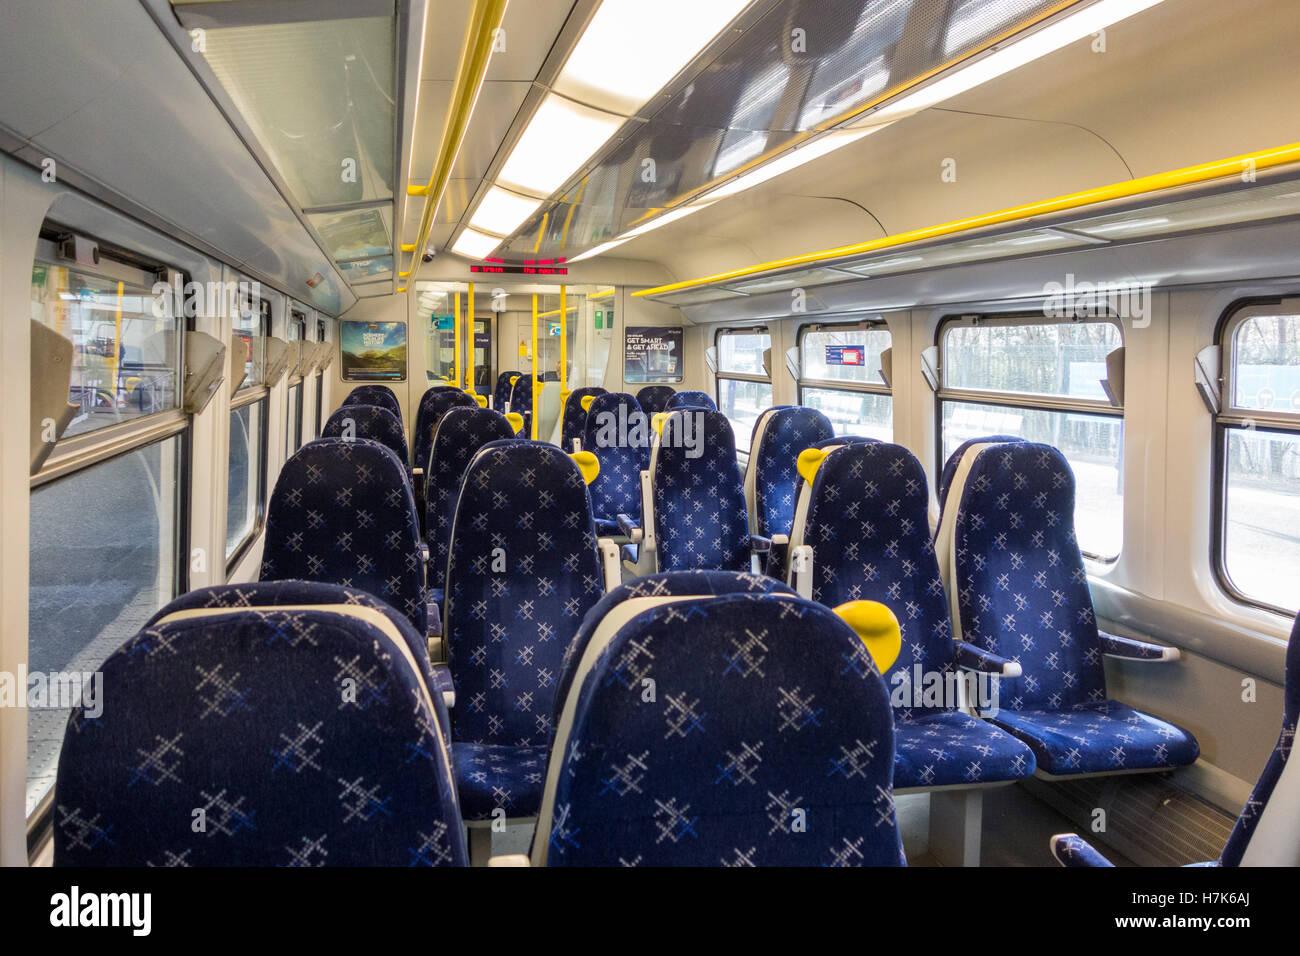 Tren ScotRail transporte interior, Scotland, Reino Unido Imagen De Stock